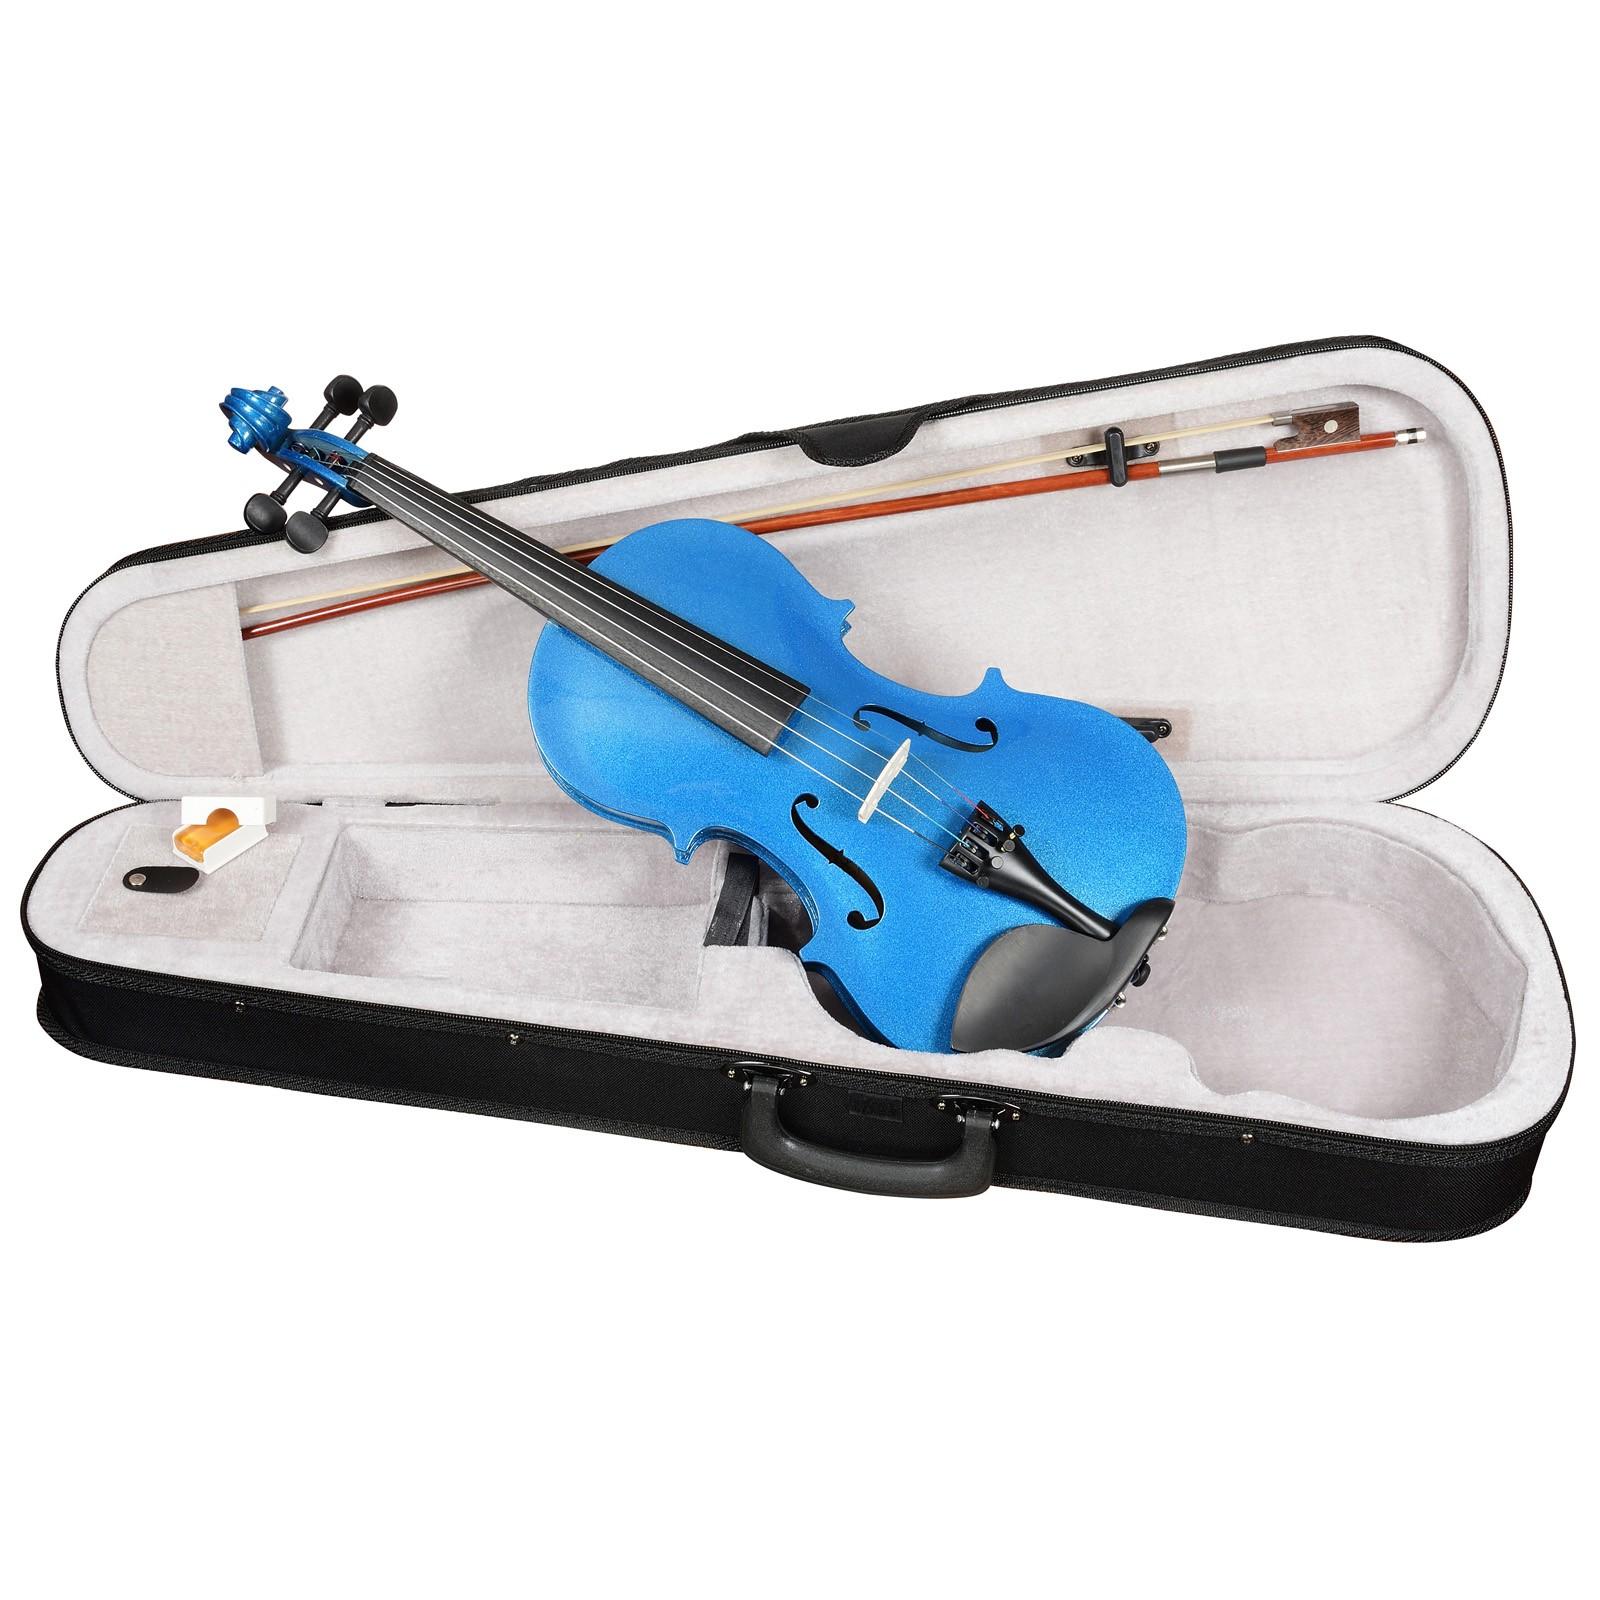 ANTONIO LAVAZZA VL-20 BL 1/8 - Скрипка размер 1/8, цвет - СИНИЙ металлик (КОМПЛЕКТ - кейс + смычок + канифоль)